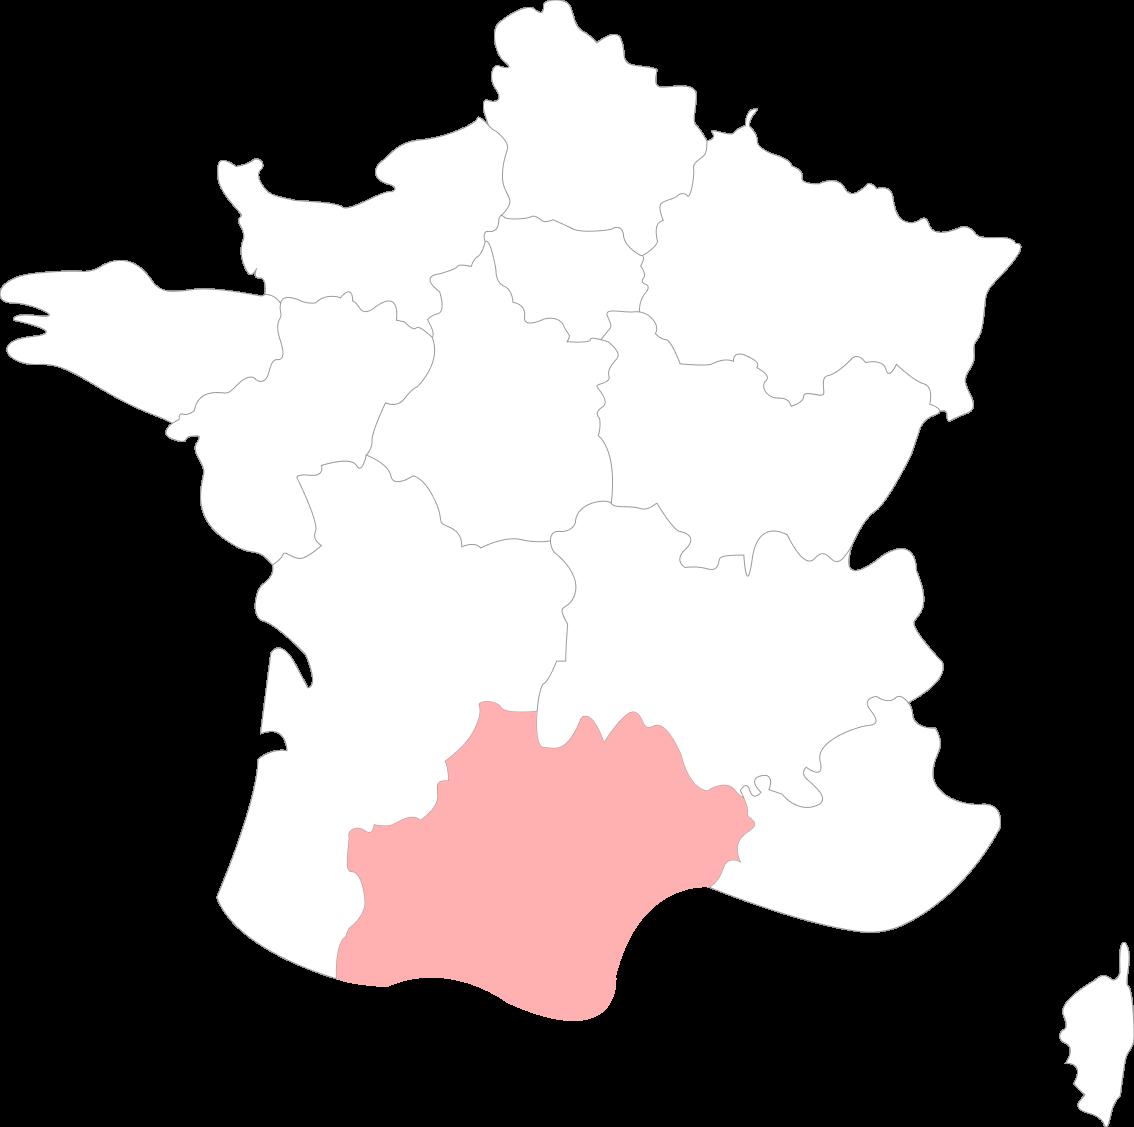 Map de l'occitanie